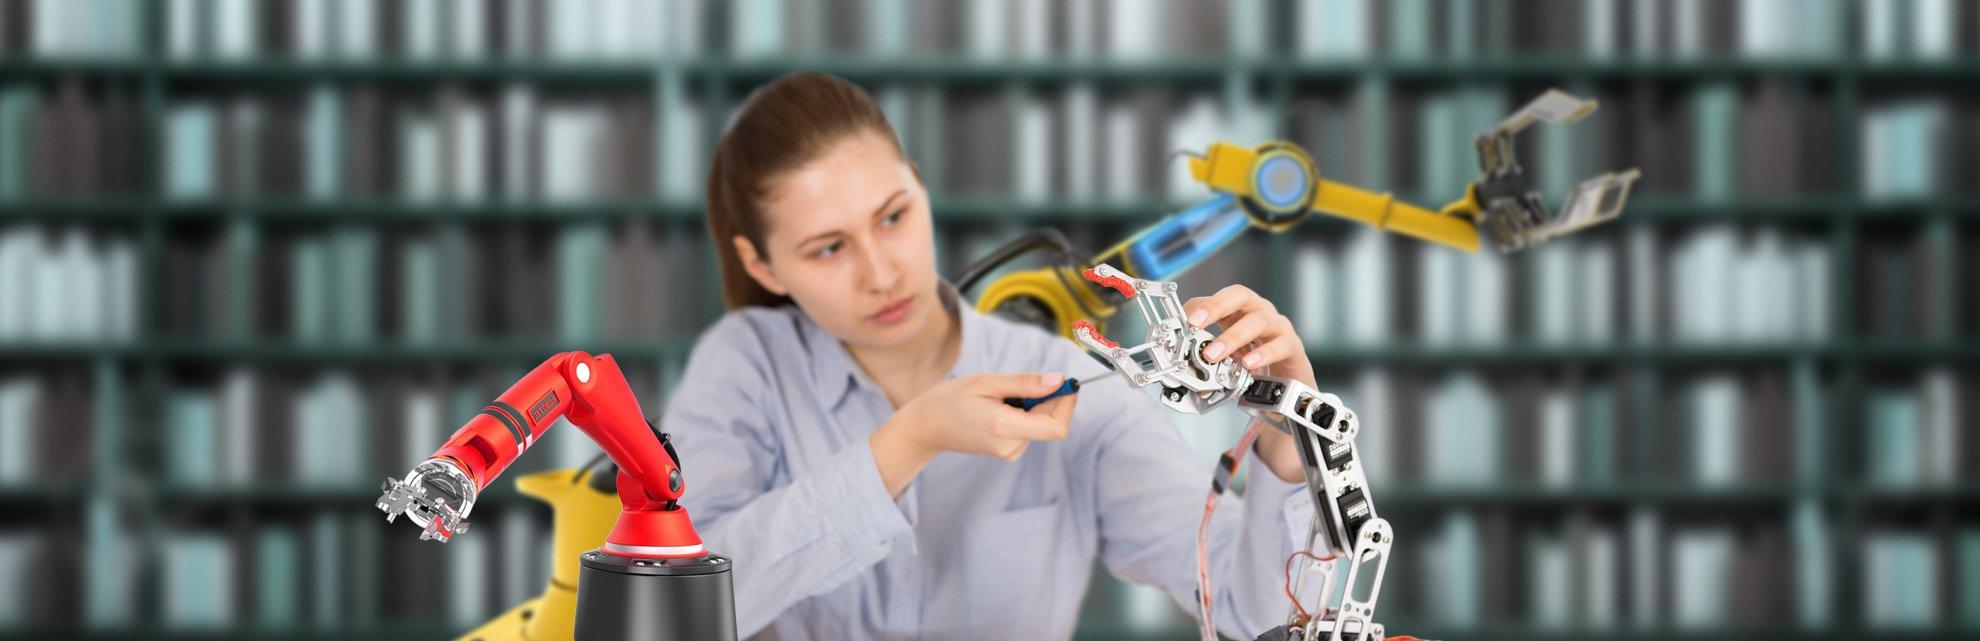 STEM Education Resource - Top Banner: Engineering